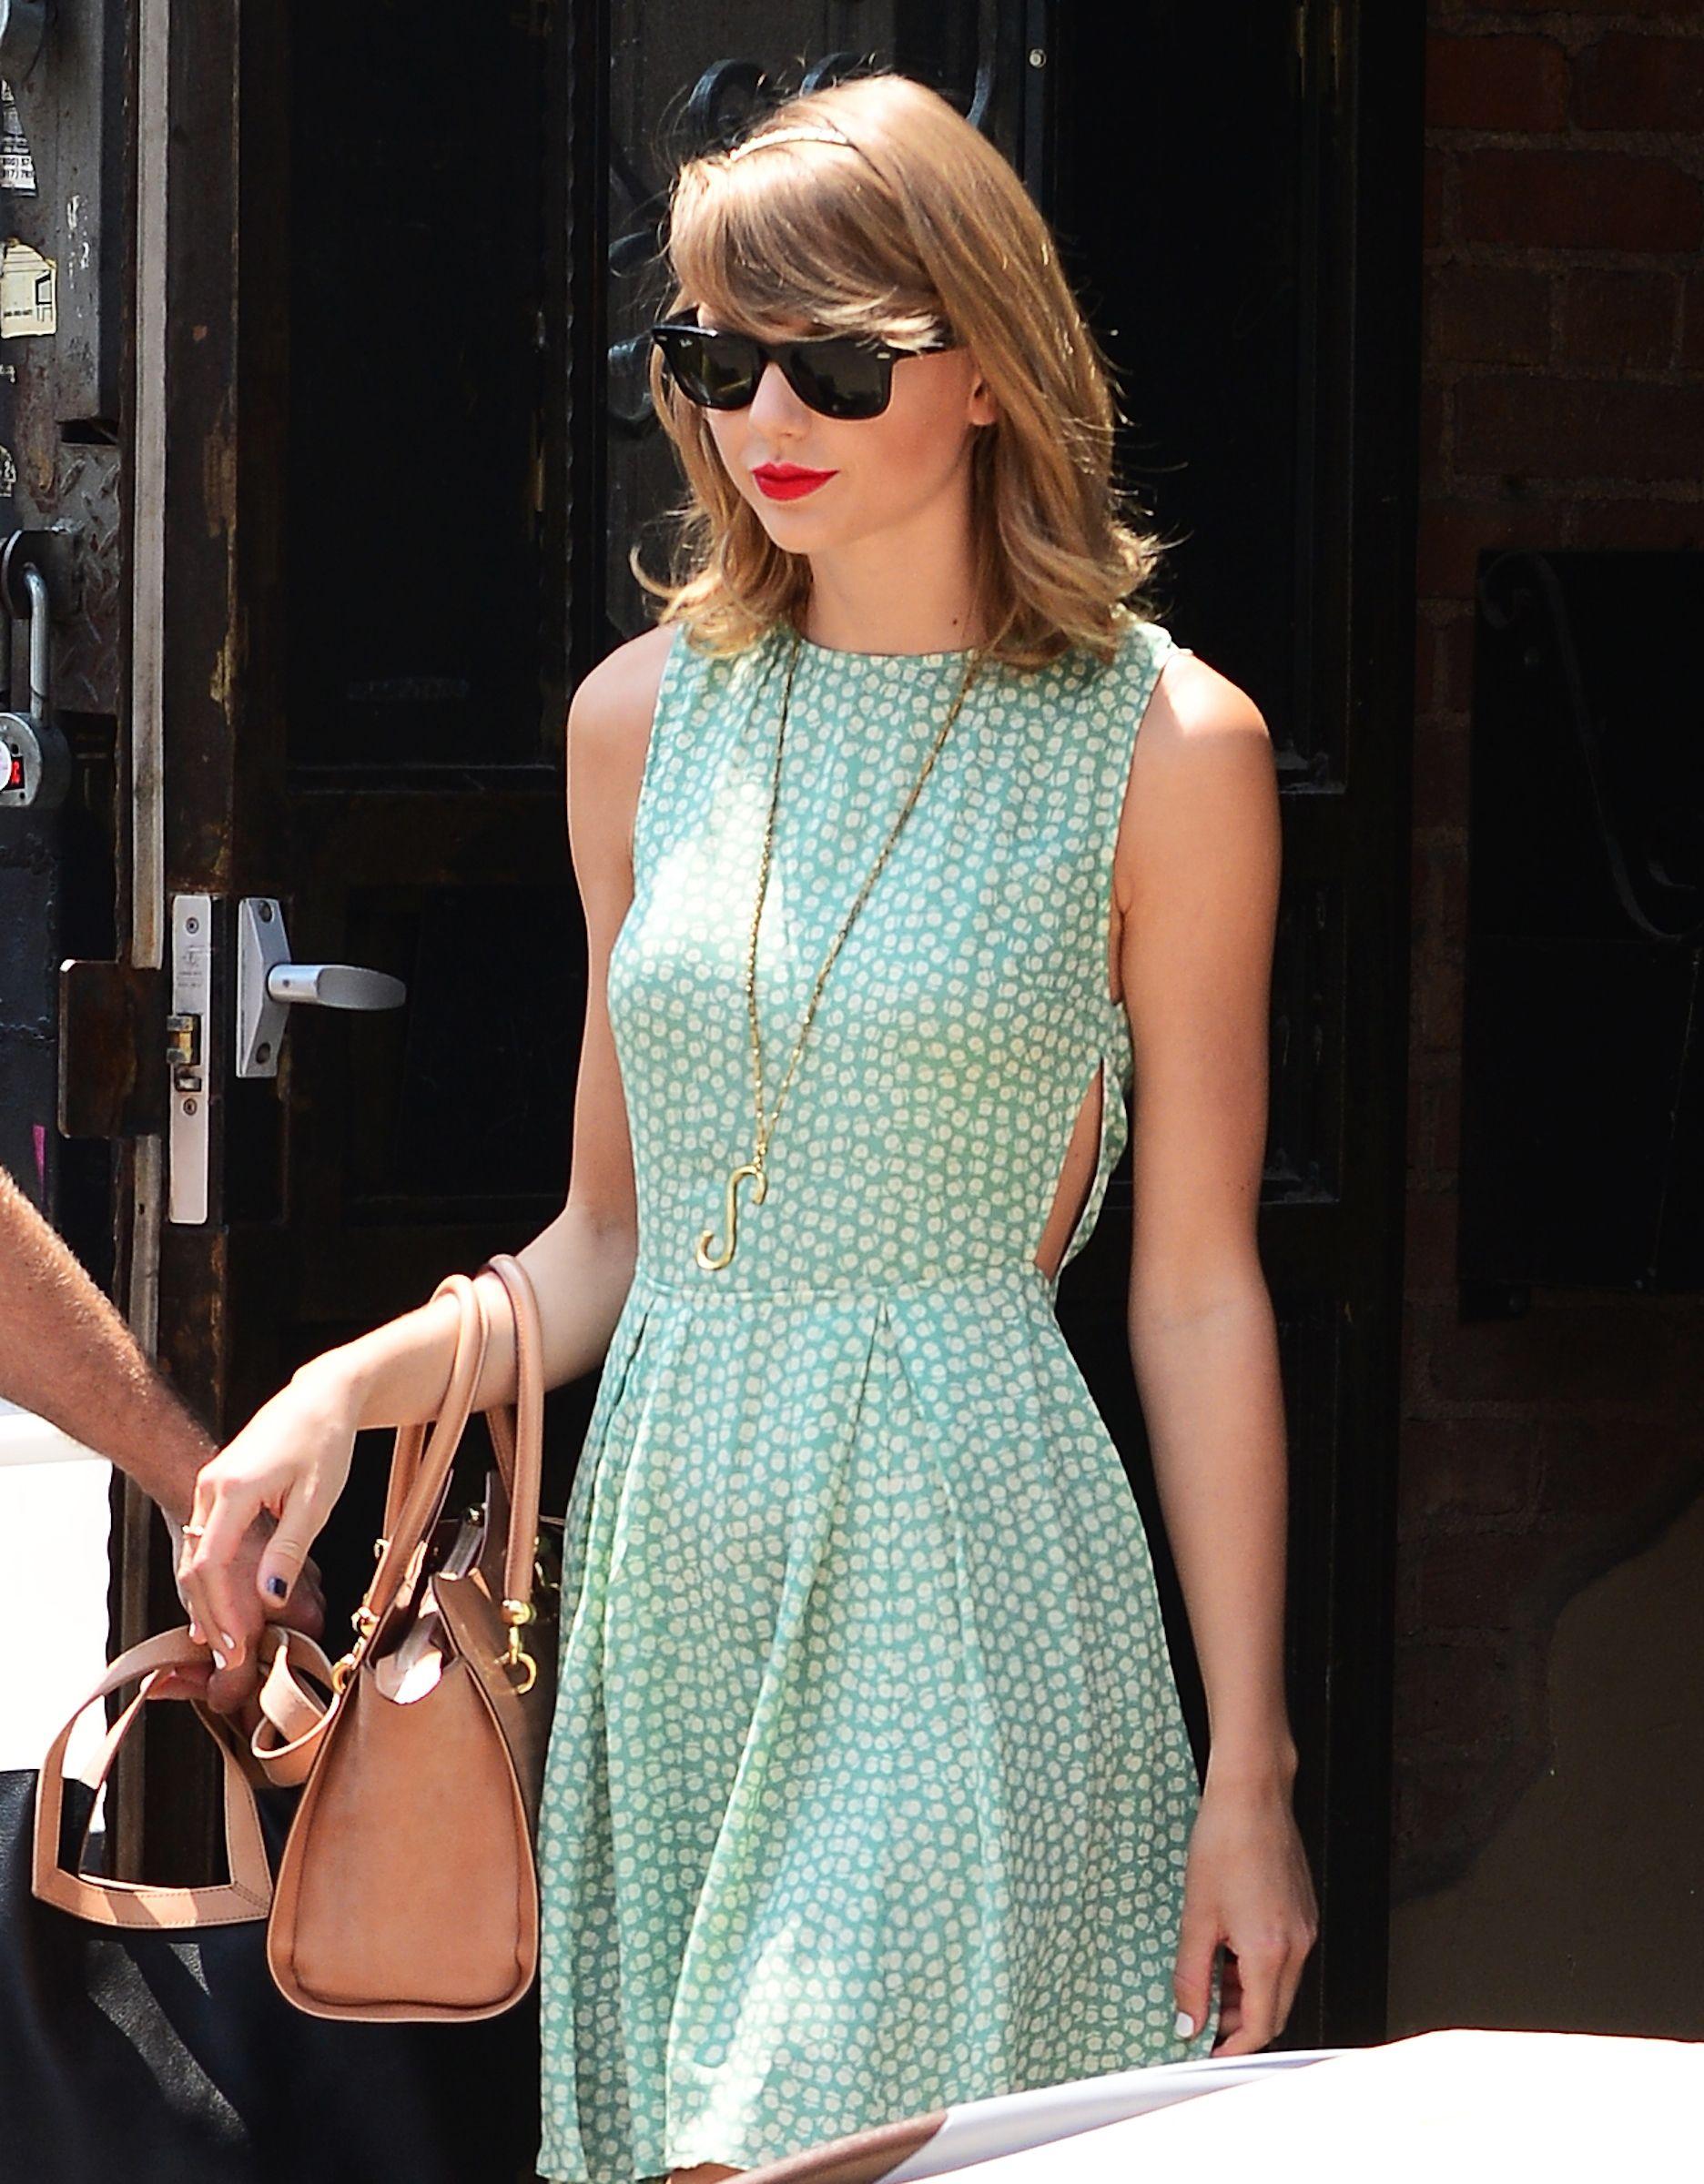 Celebrity Sightings In New York City - July 22, 2014